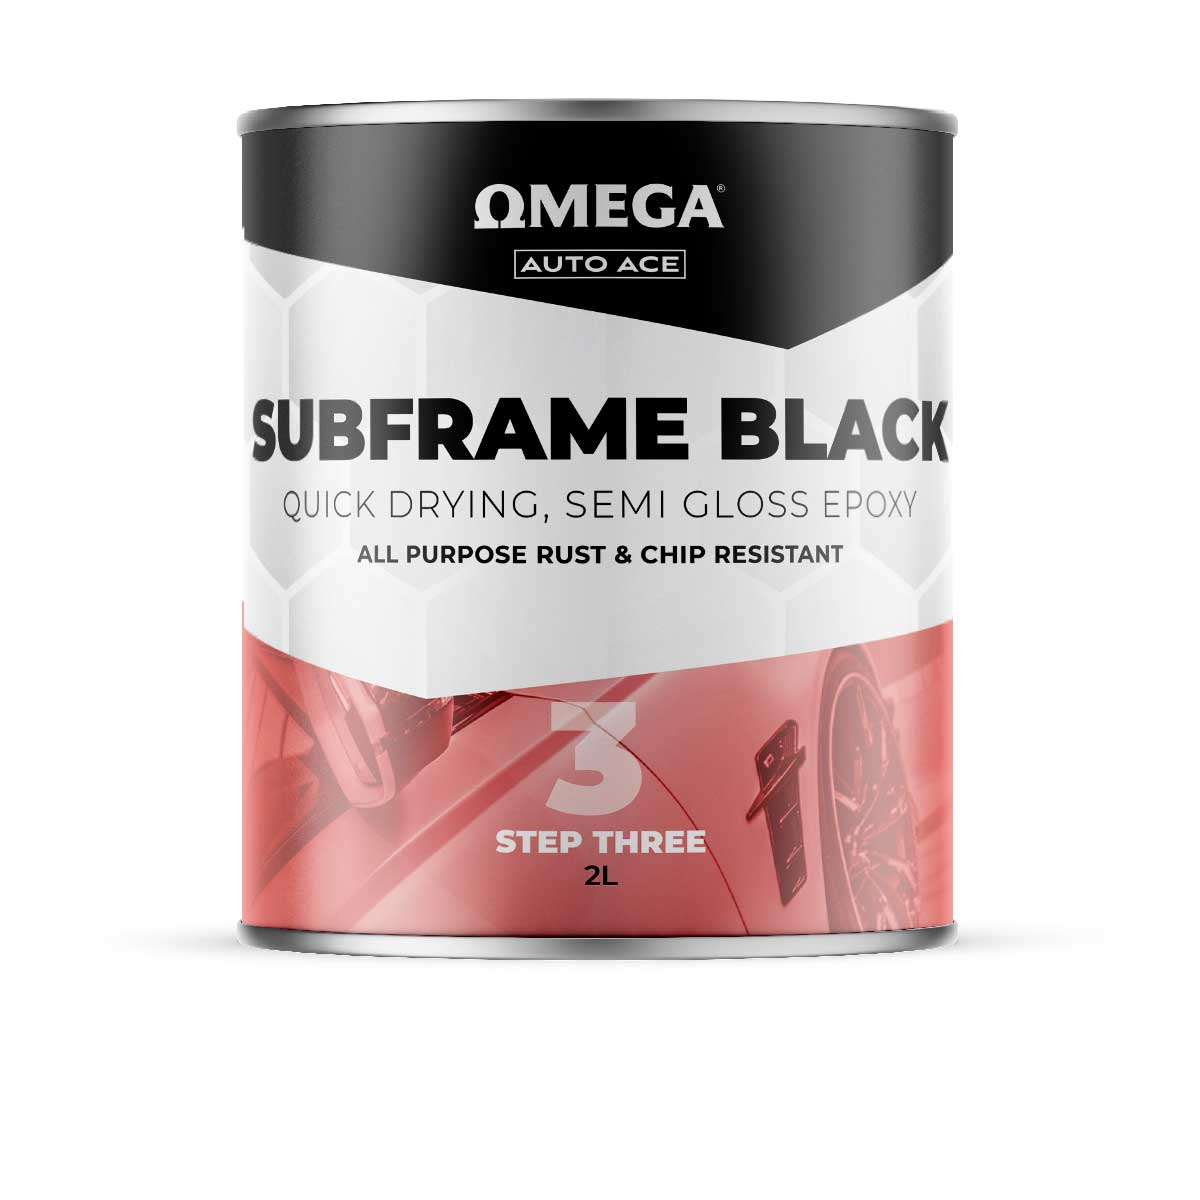 Omega Auto Ace Subframe Black 2lt